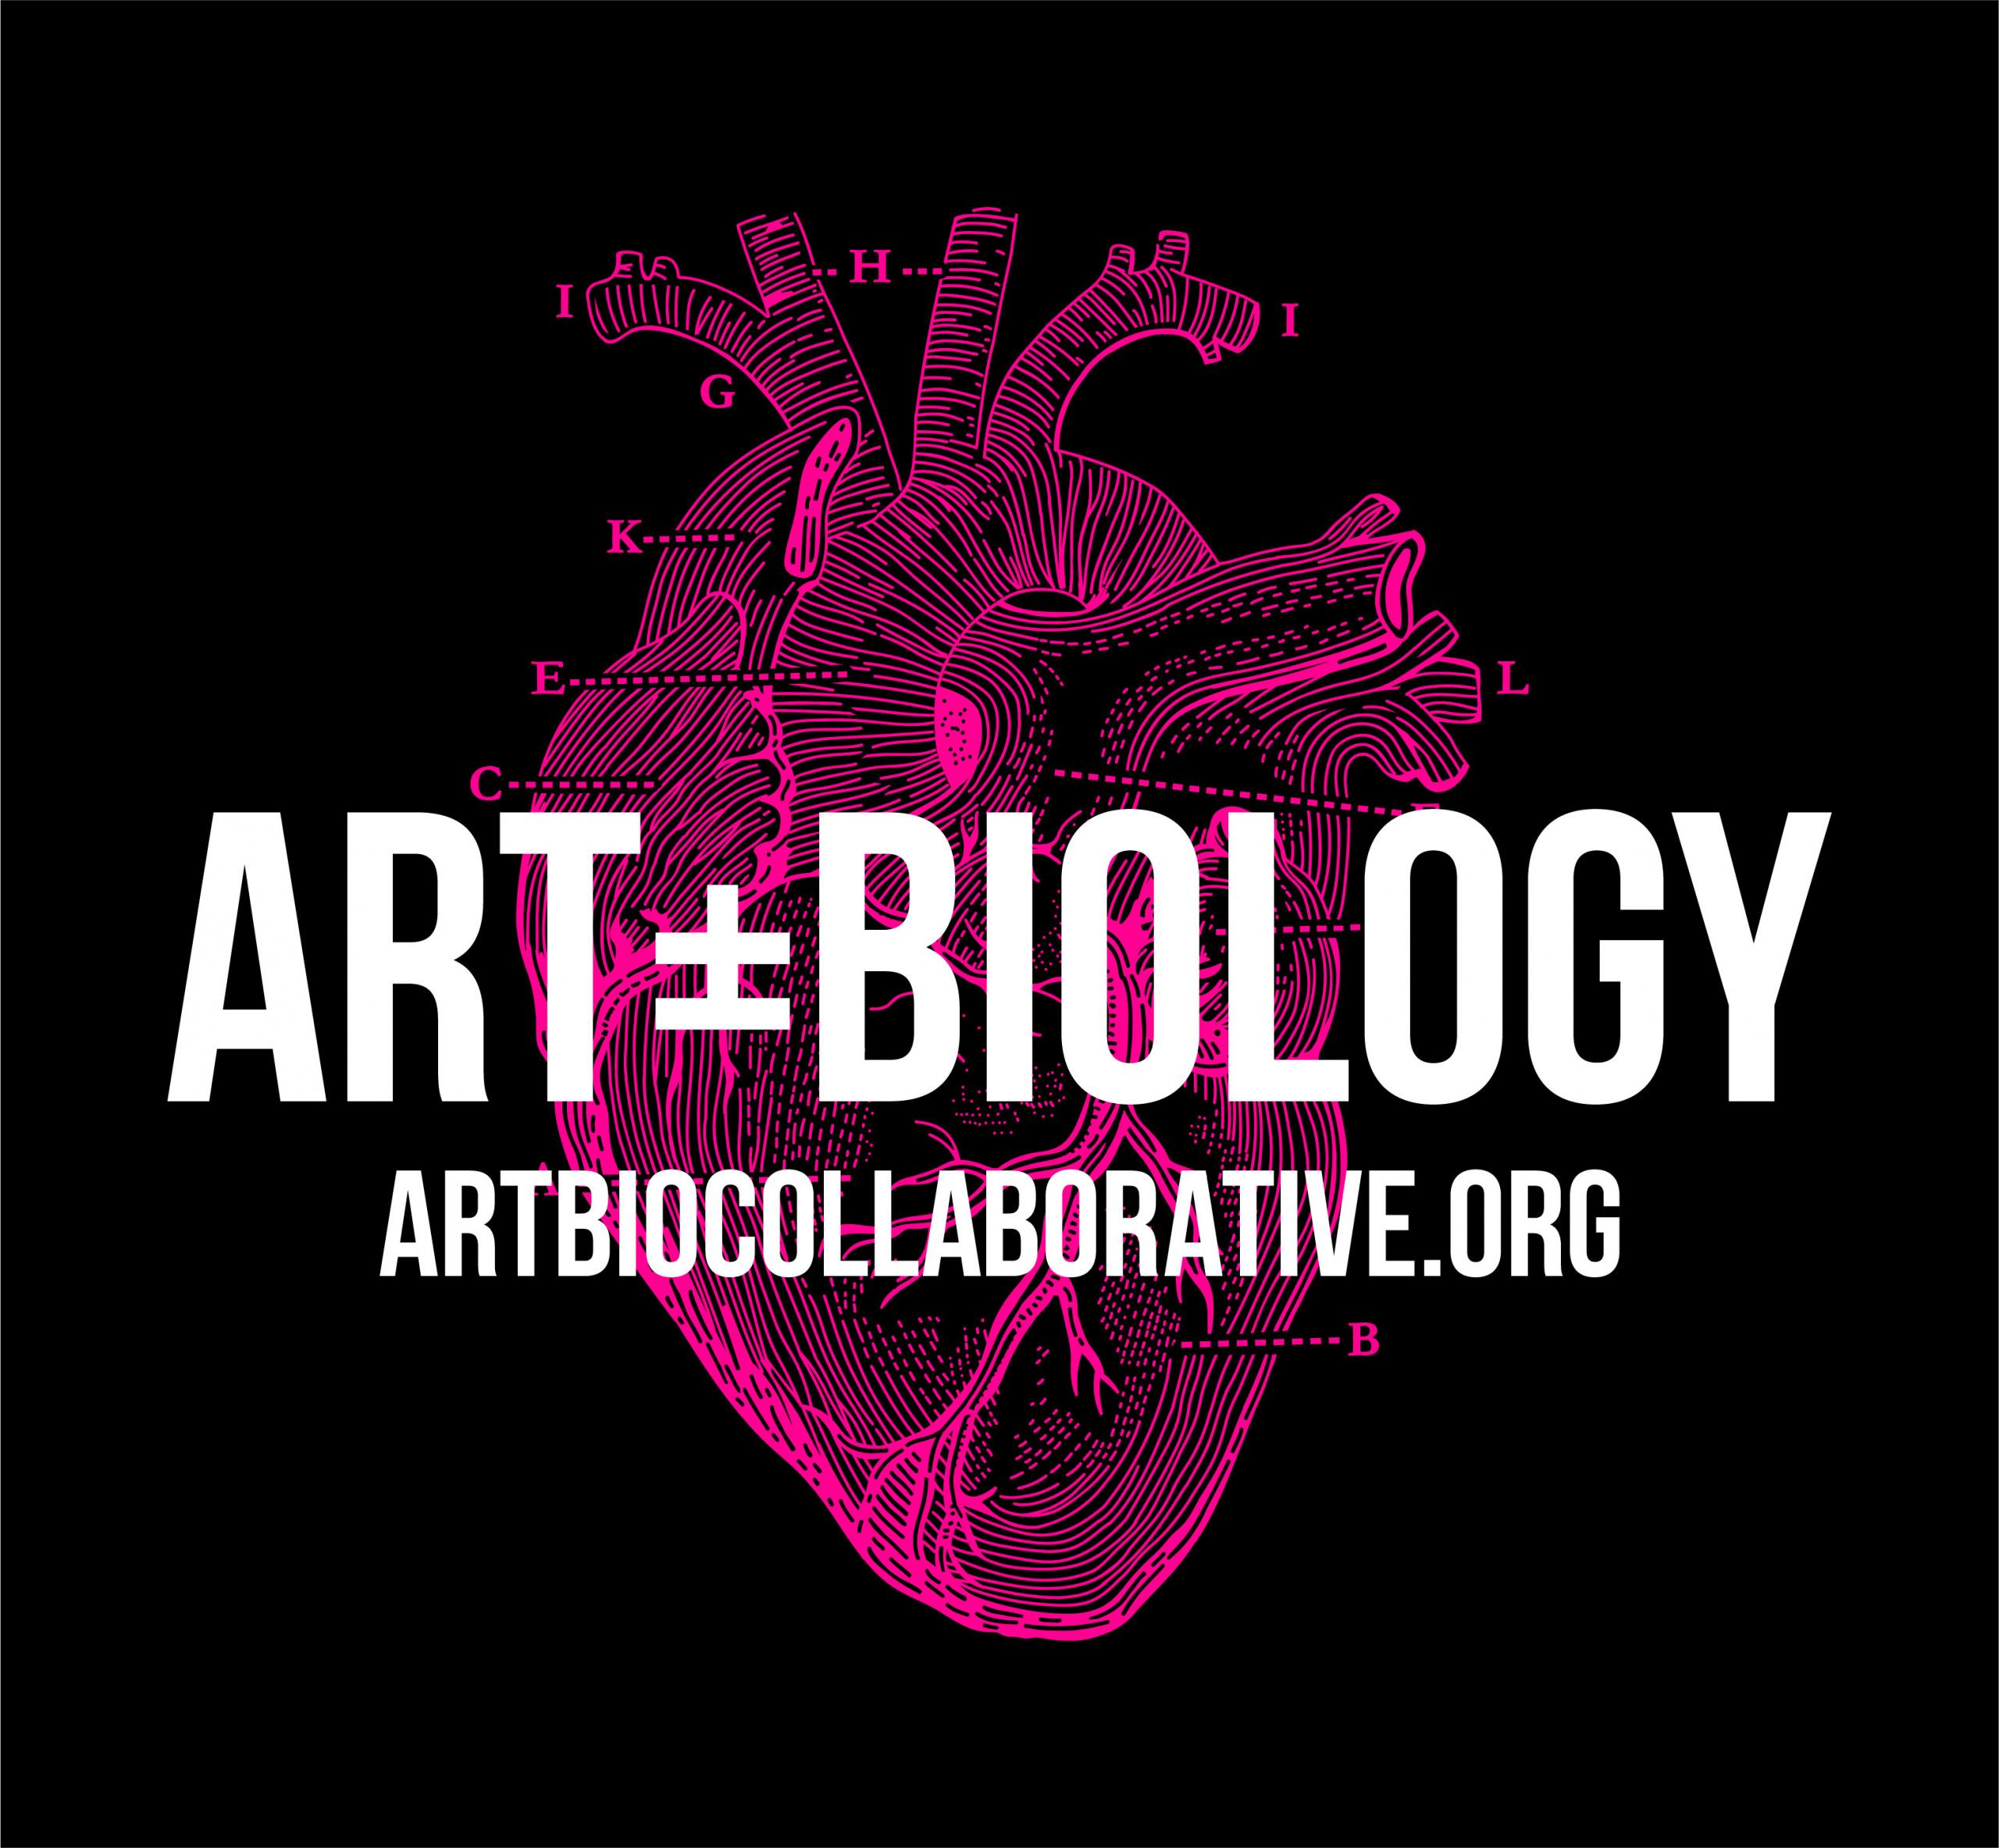 artbiology-heart-logo